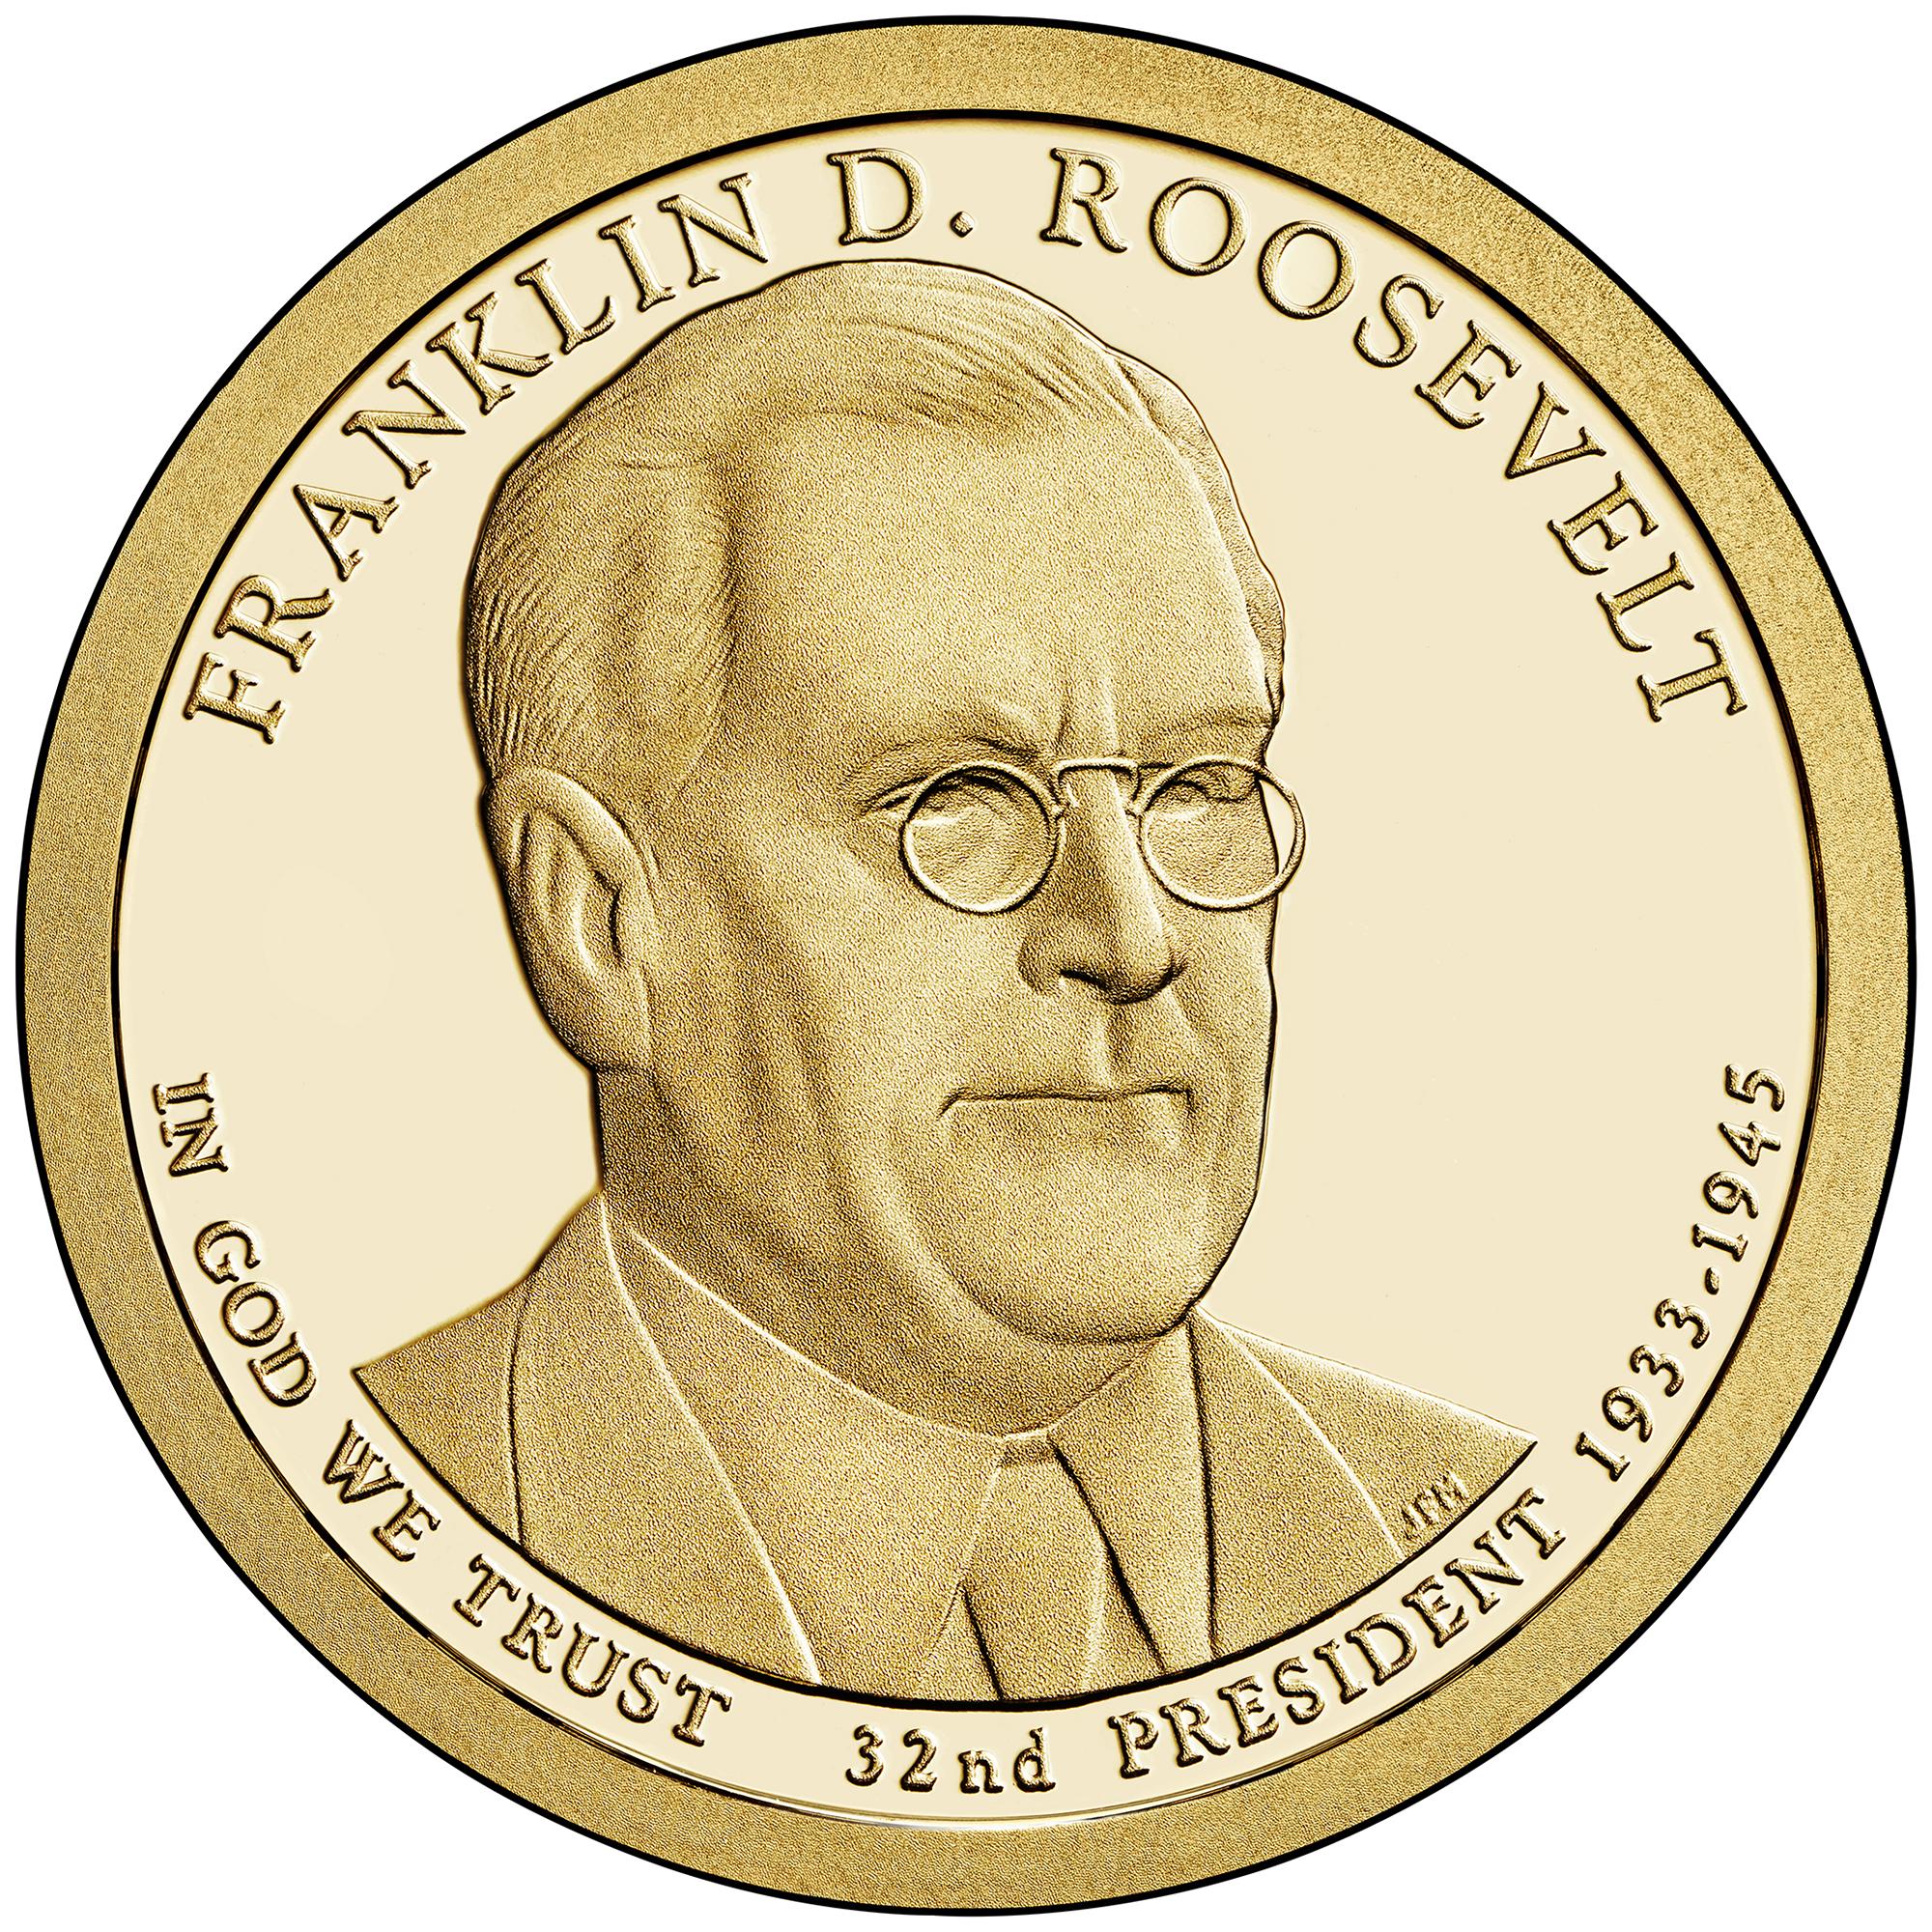 2014 Presidential Dollar Coin Franklin D. Roosevelt Proof Obverse